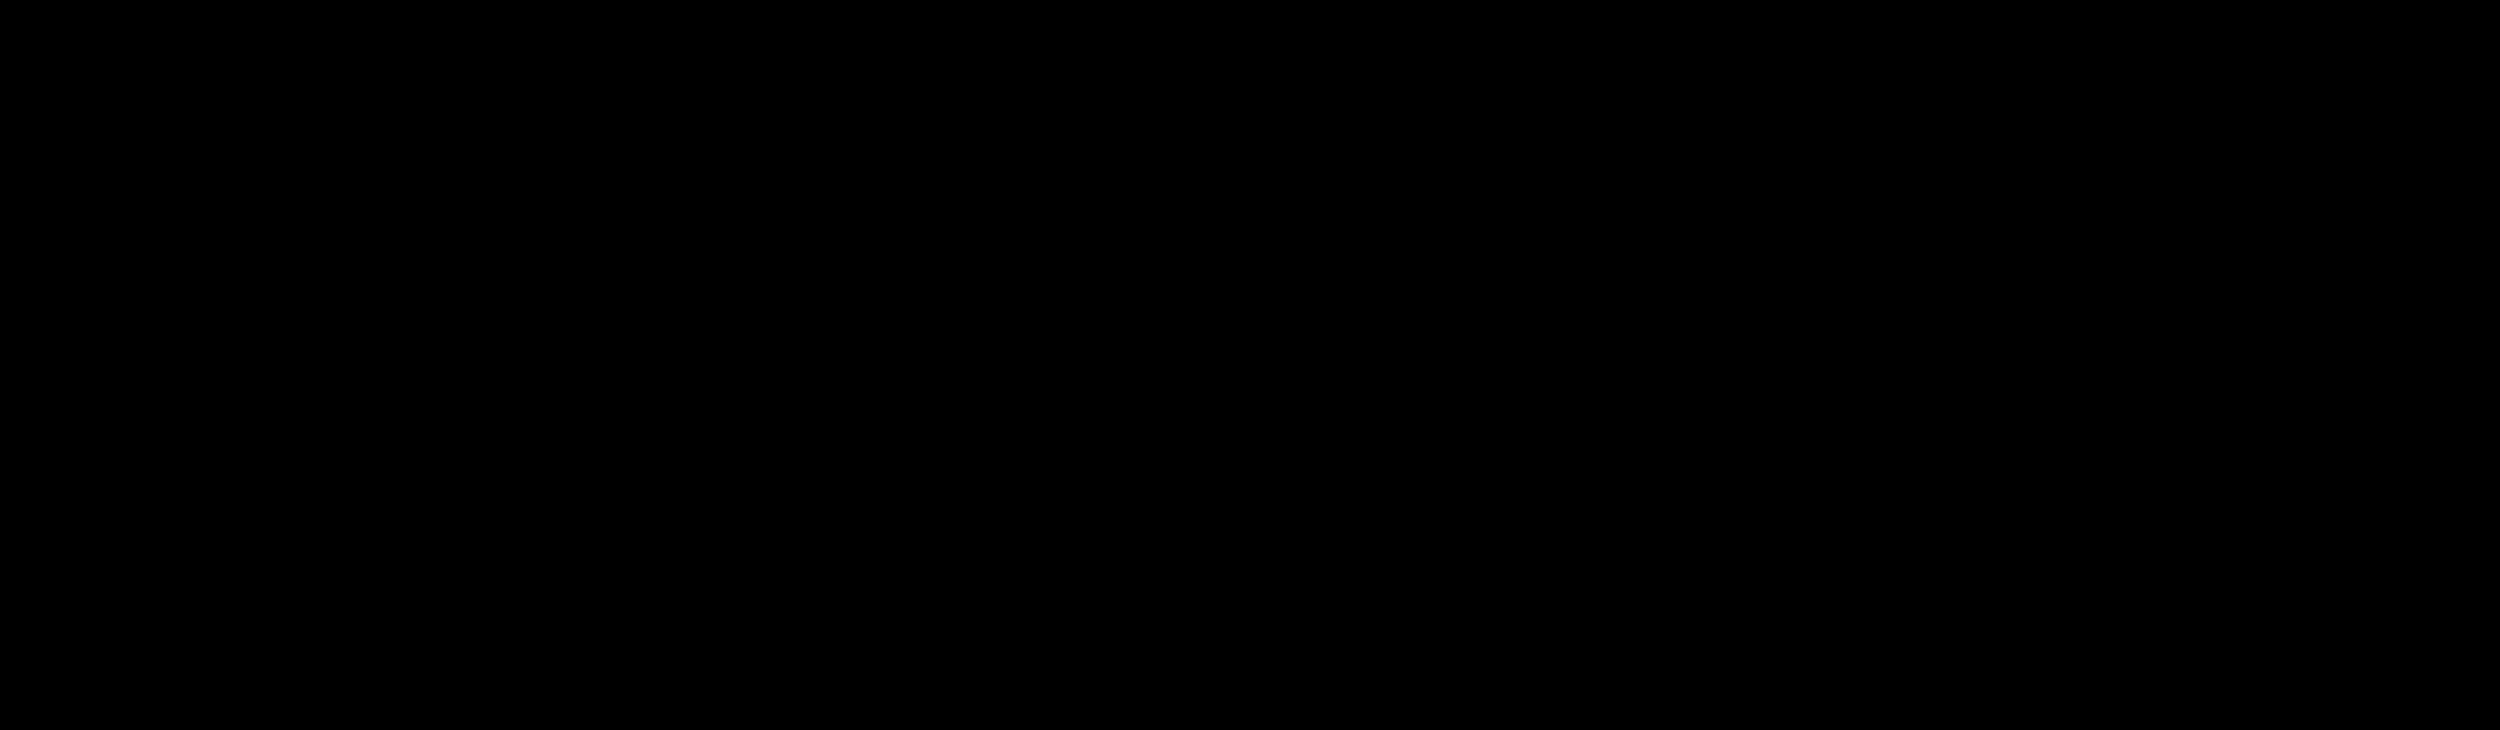 Christpoher Pad - Black.png